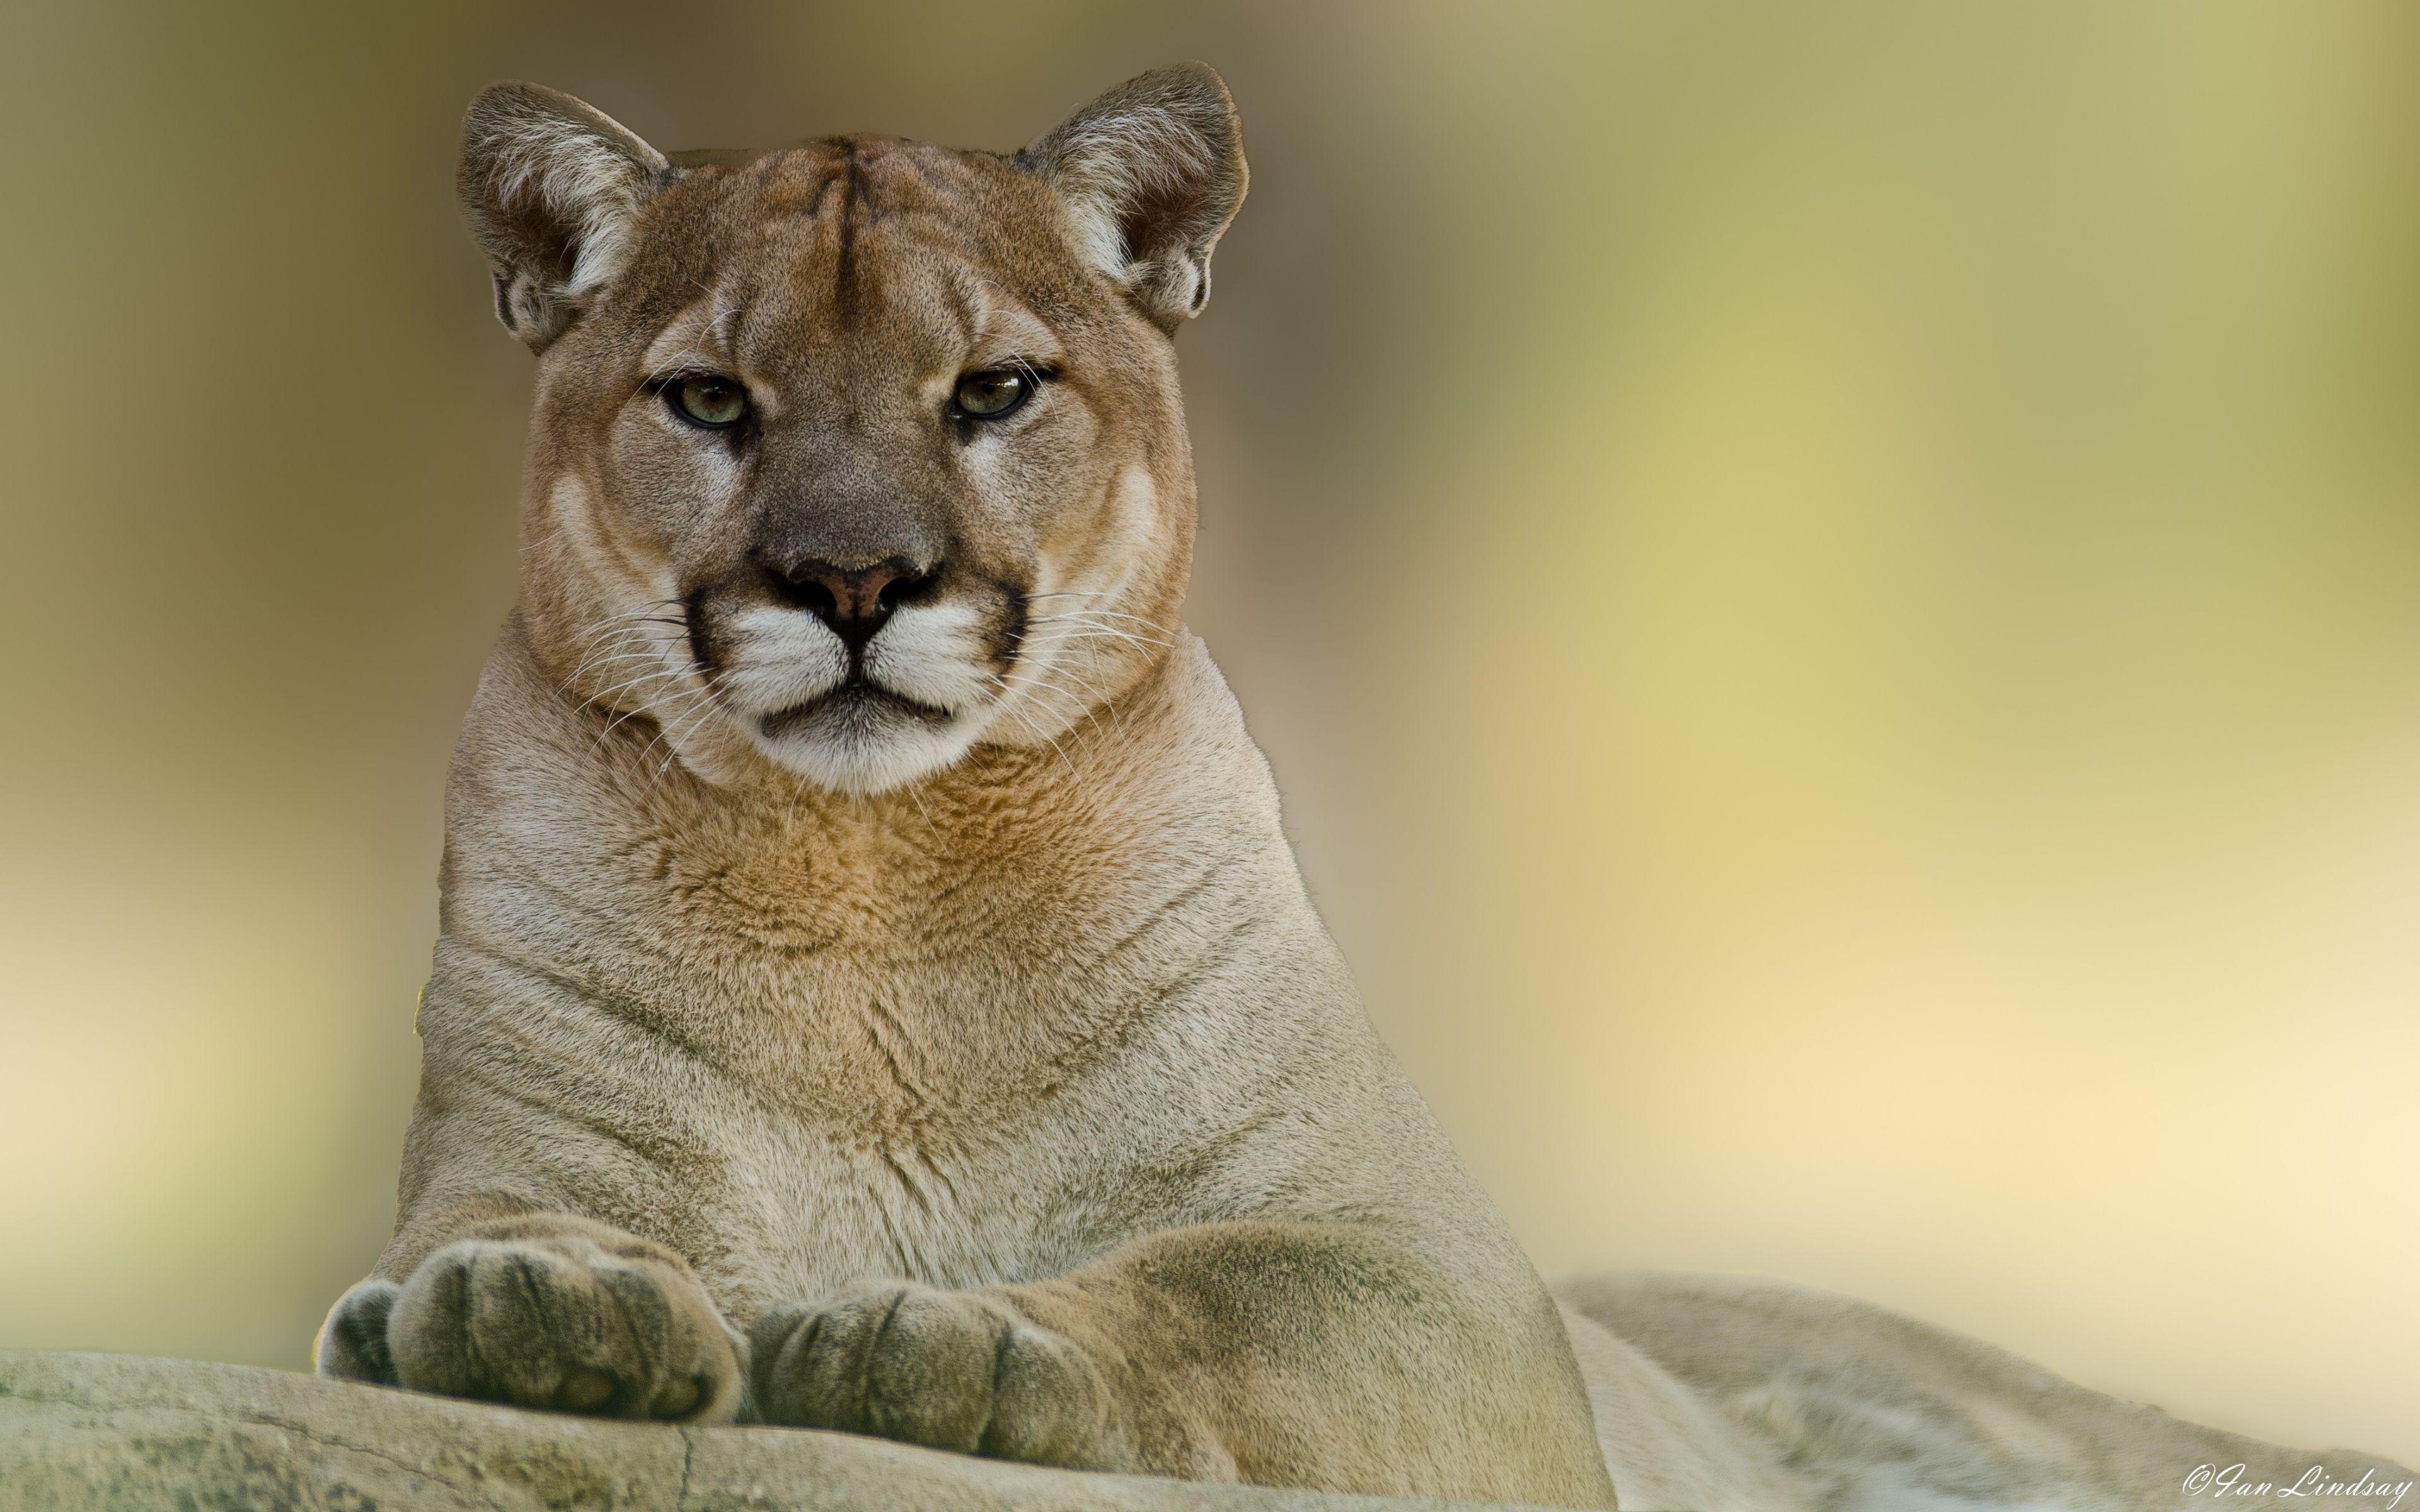 3840x2400 wallpaper puma, cougar, mountain, lion | animal • cougar